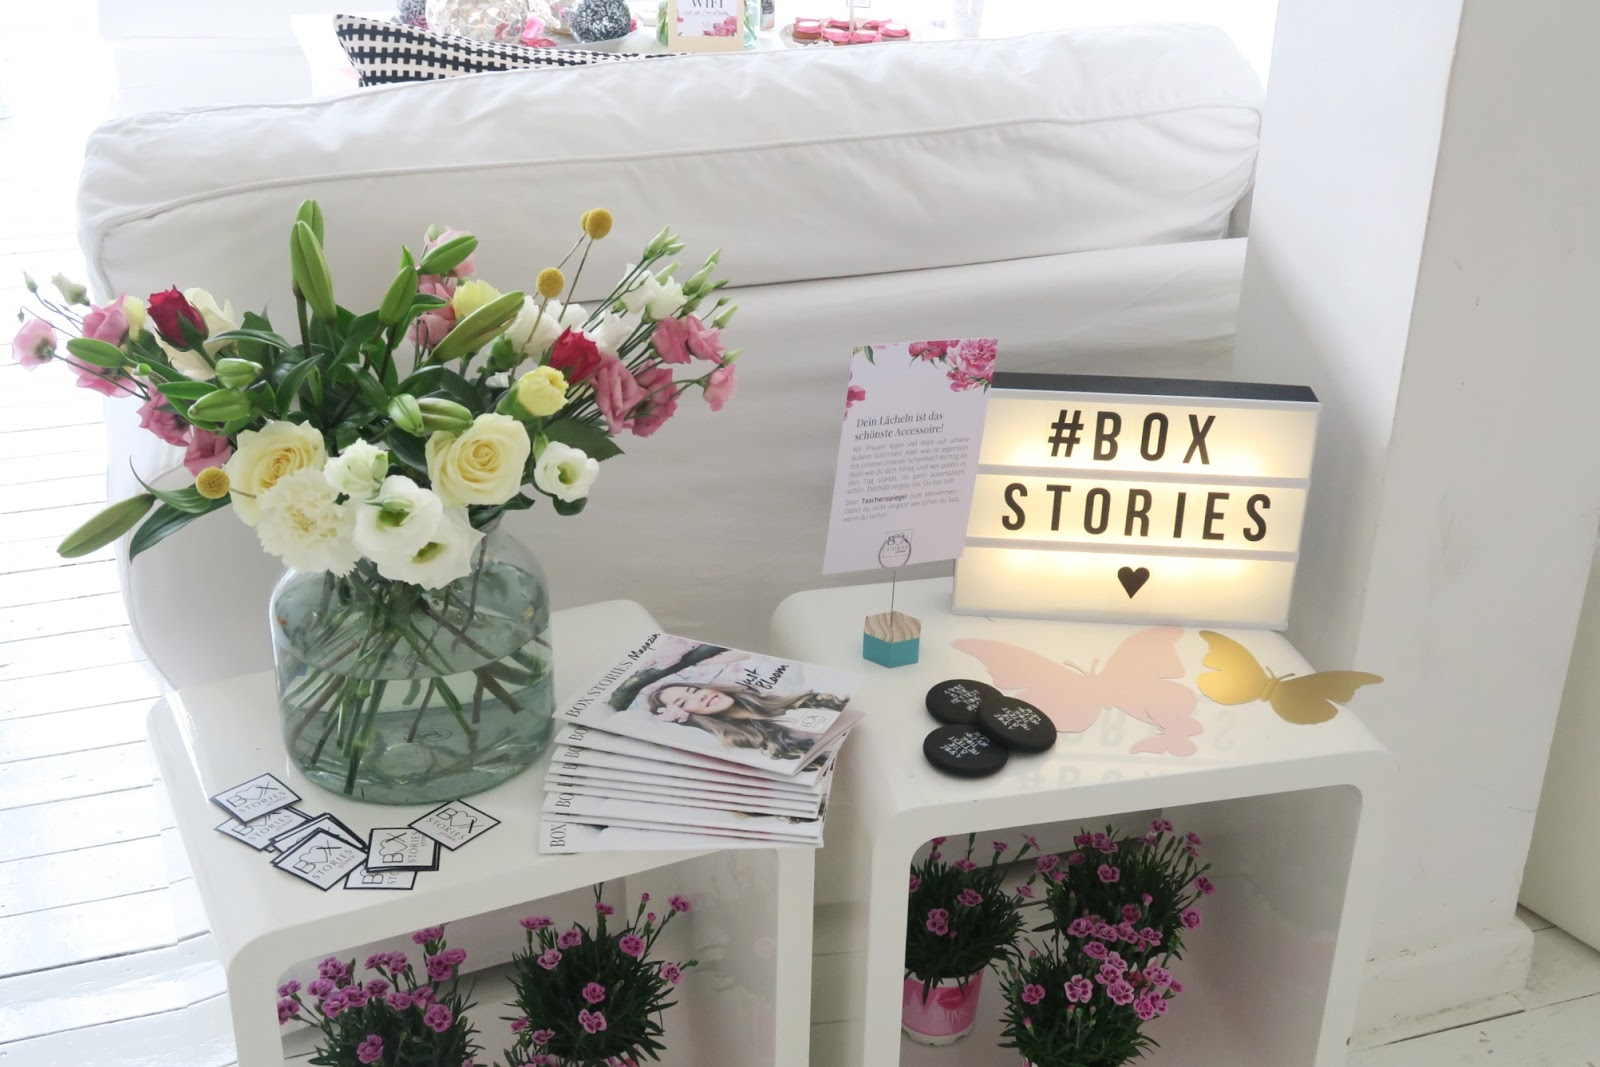 abo box, beauty, blogger event, bloggerevent, box stories, deko, detox, event, fashion, flower crown diy, fotoshooting, gofeminin, hamburg, inhalt, just bloom, launch, lifestyle, lux location, magazin, review,